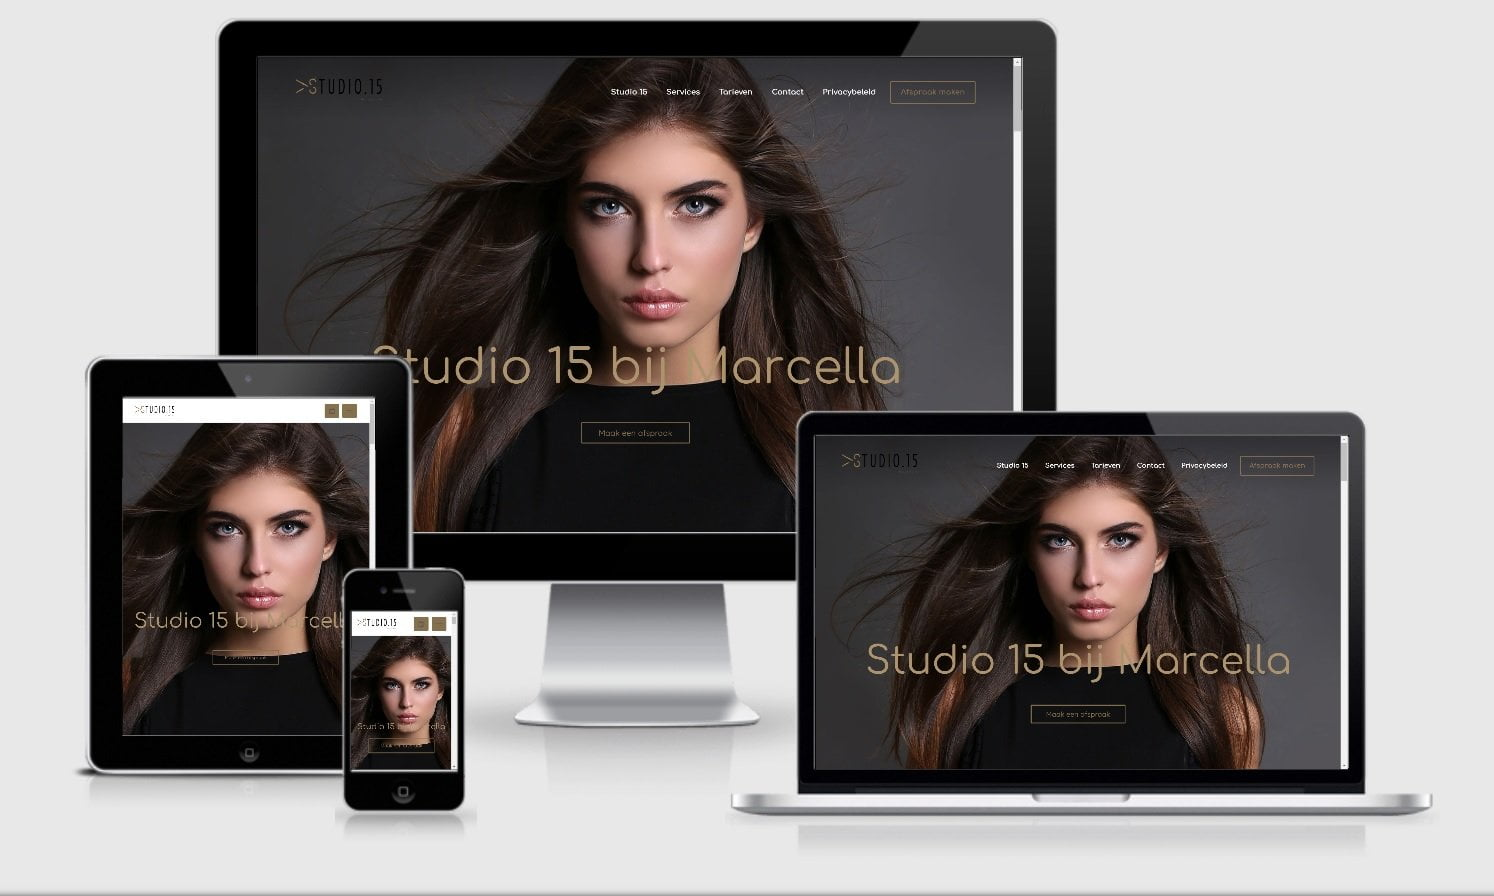 Webdesign Mockup Studio 15 bij Marcella